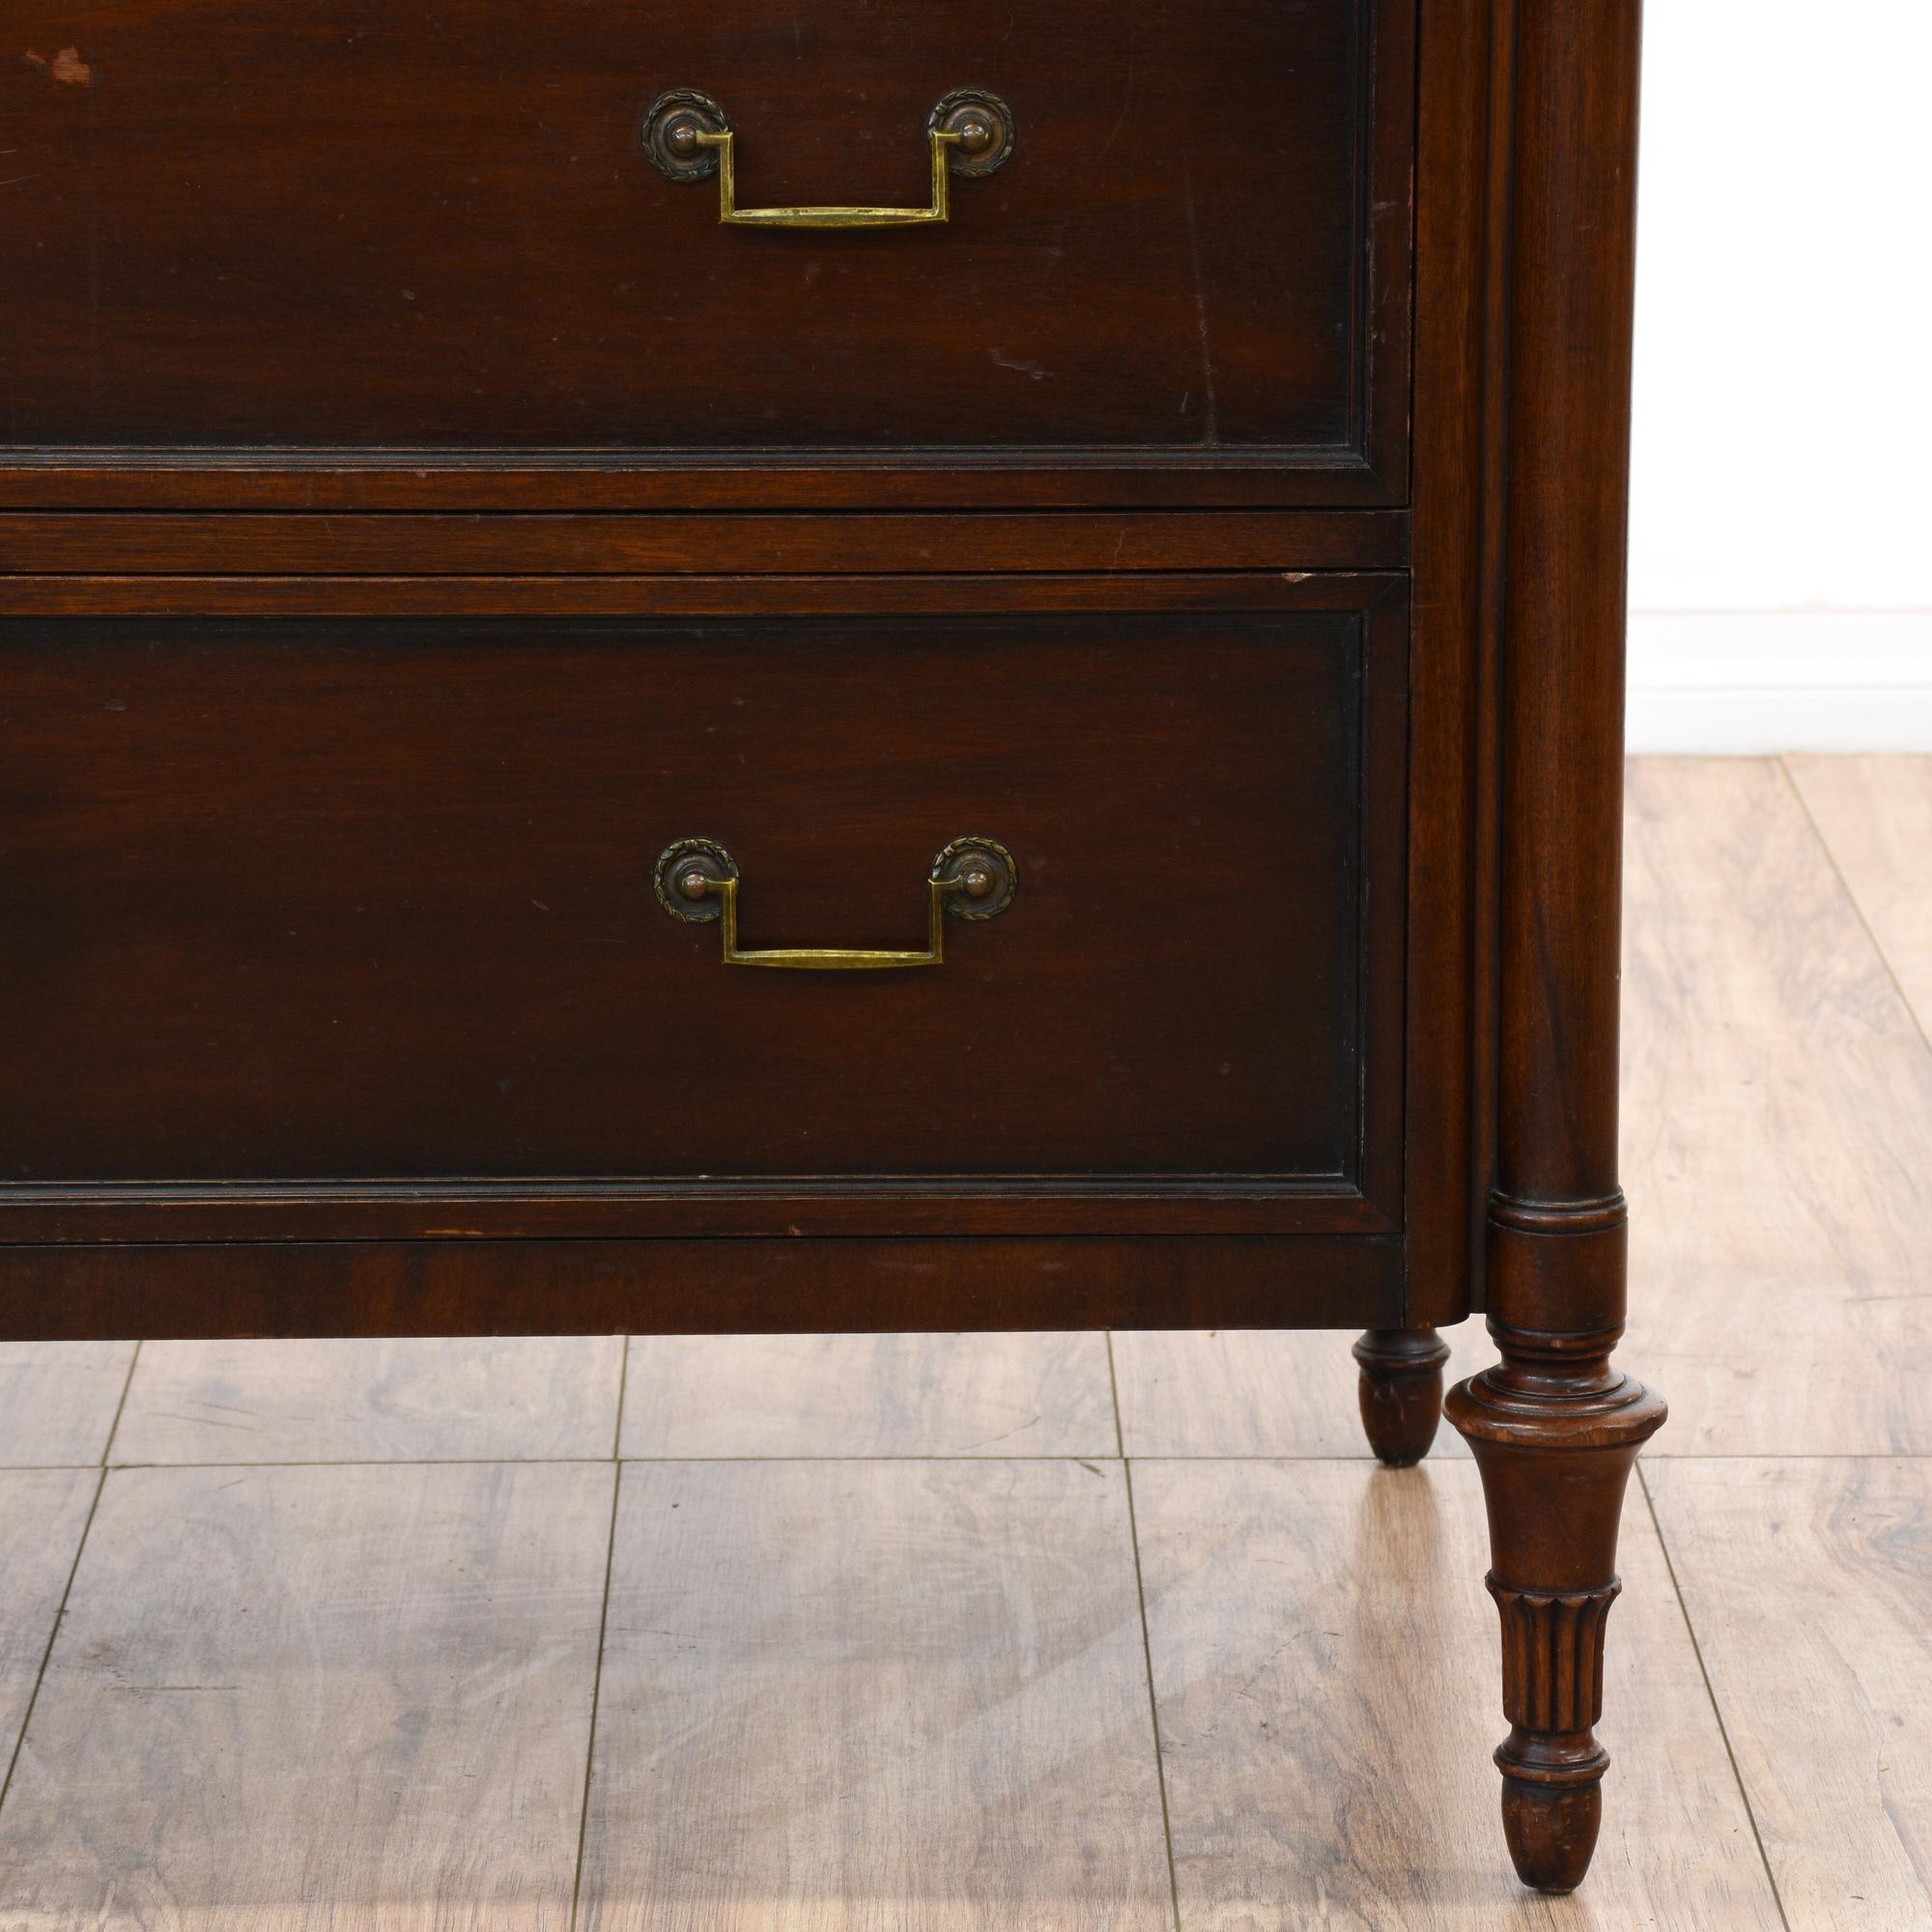 American Furniture Warehouse Desks ... Long Dresser | Loveseat Vintage Furniture San Diego & Los Angeles